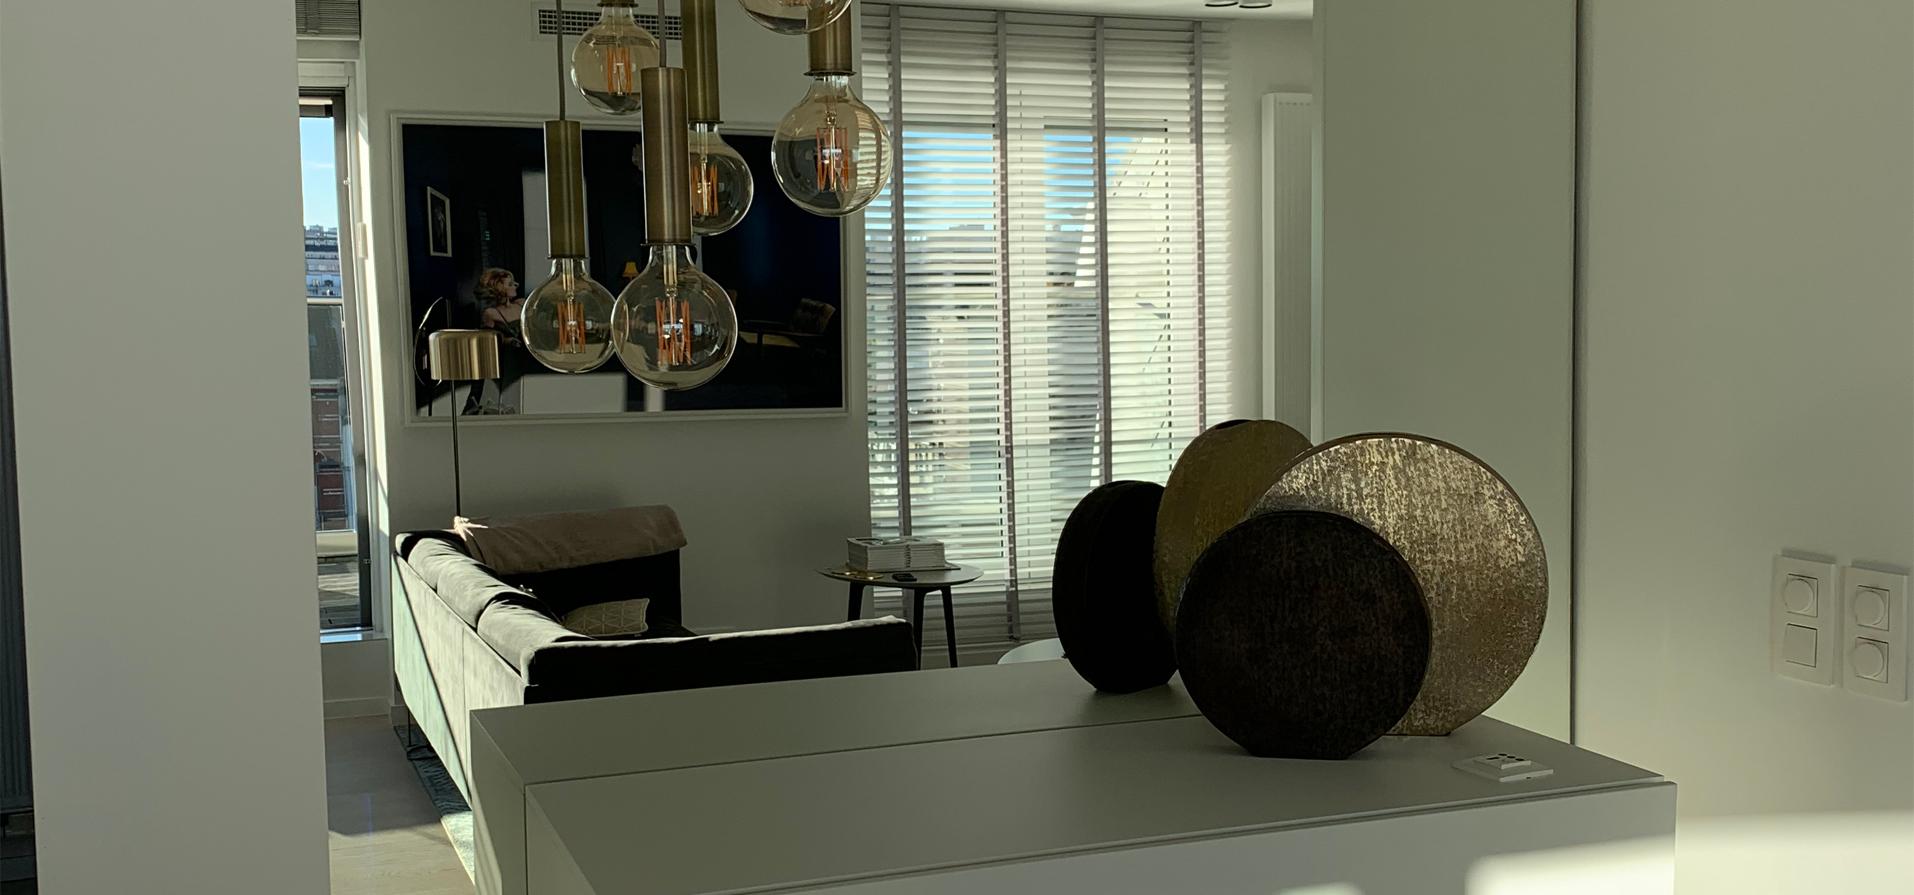 Miroiterie Leys and Fils - porte miroir